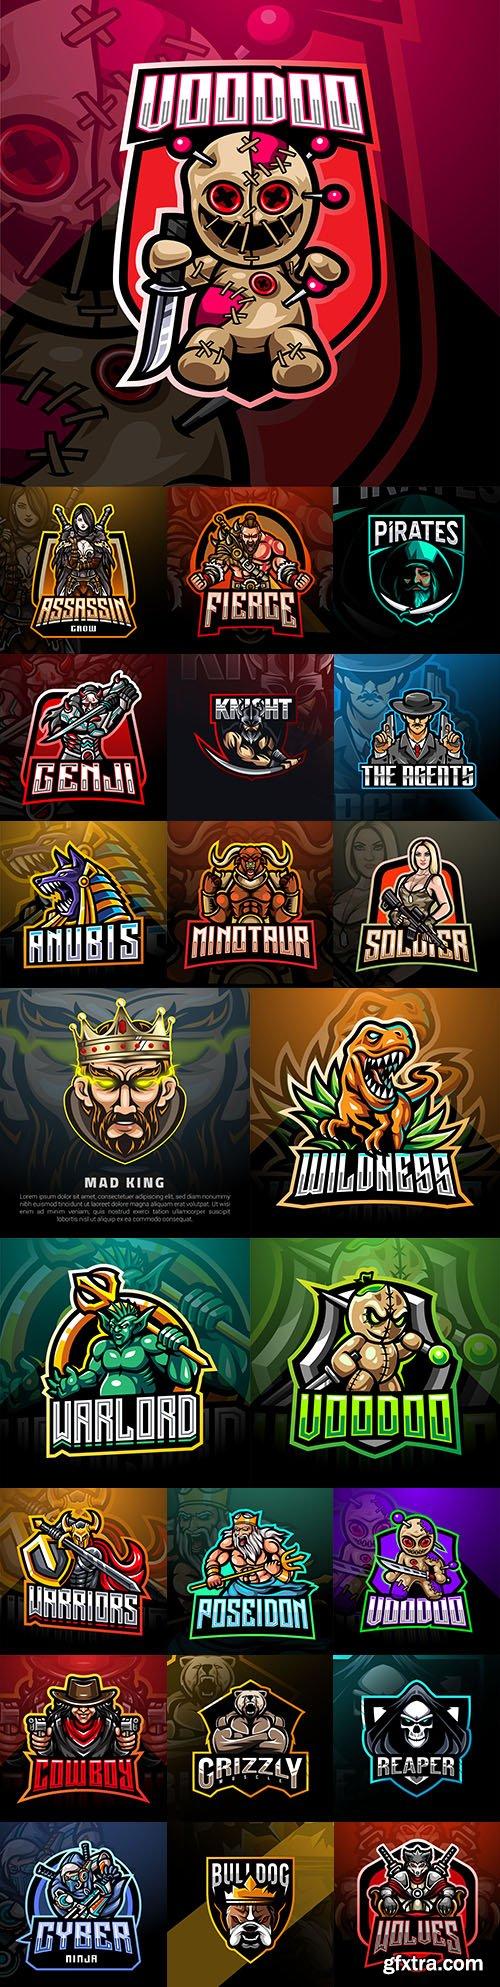 Emblem gaming mascot design cybersport illustration 30